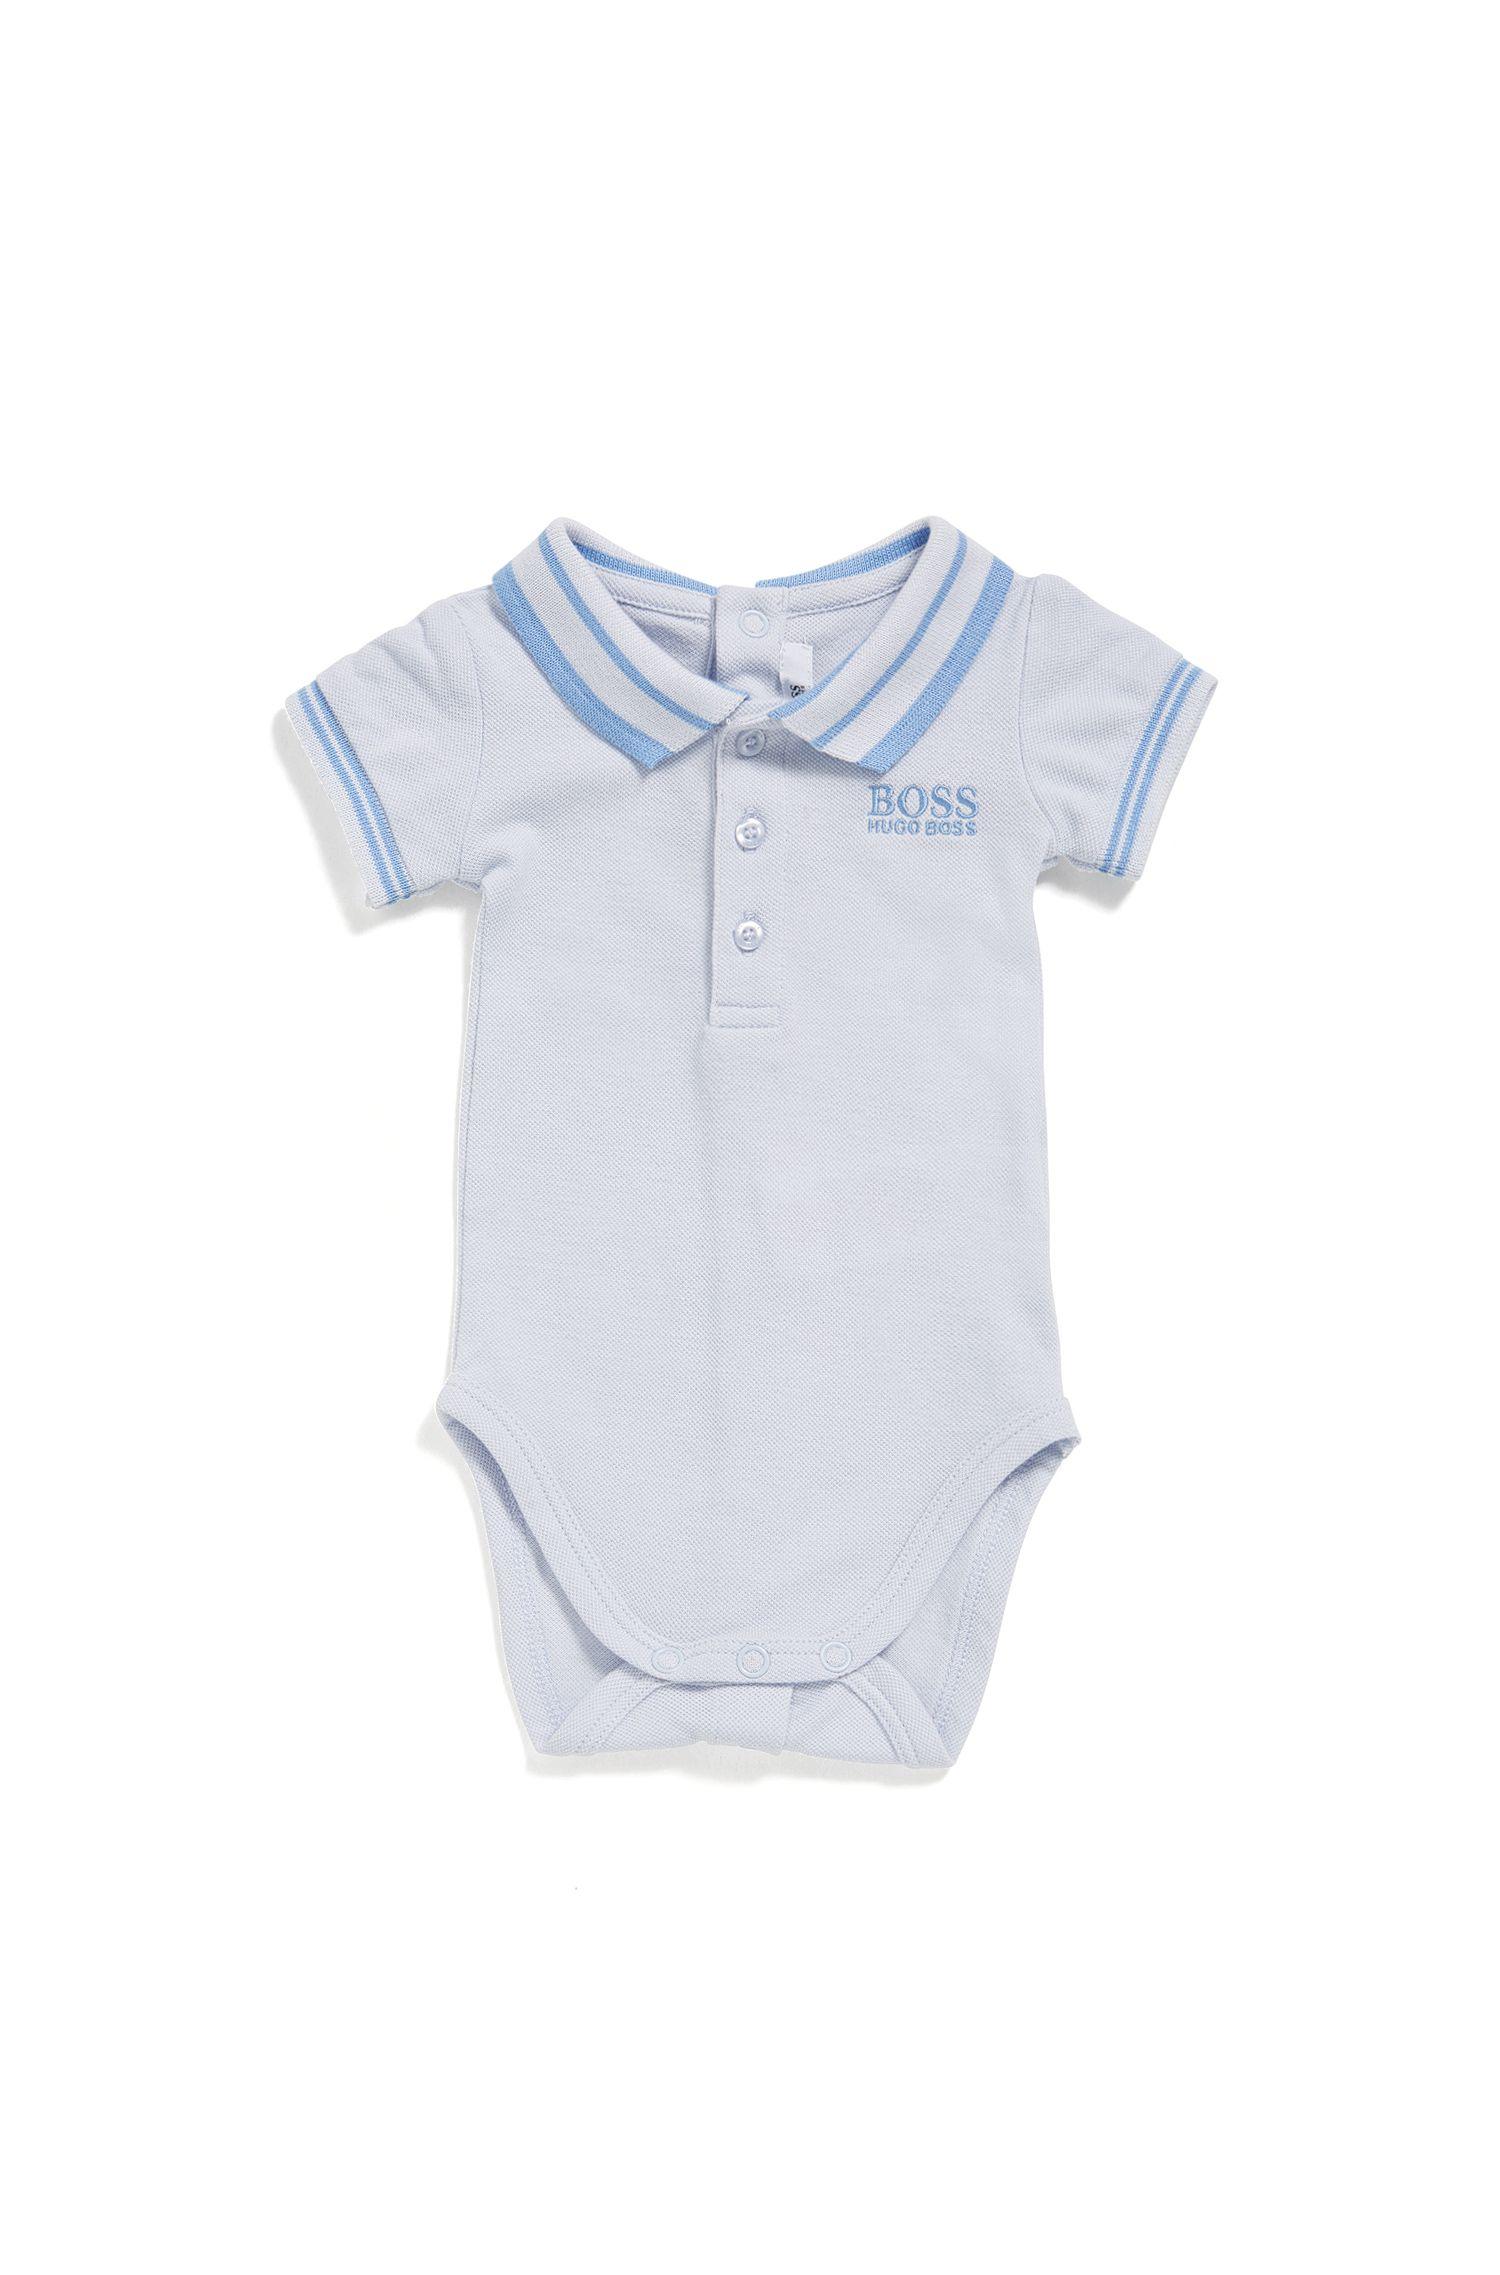 Body para bebé en algodón elástico con cuello de polo: 'J97112'